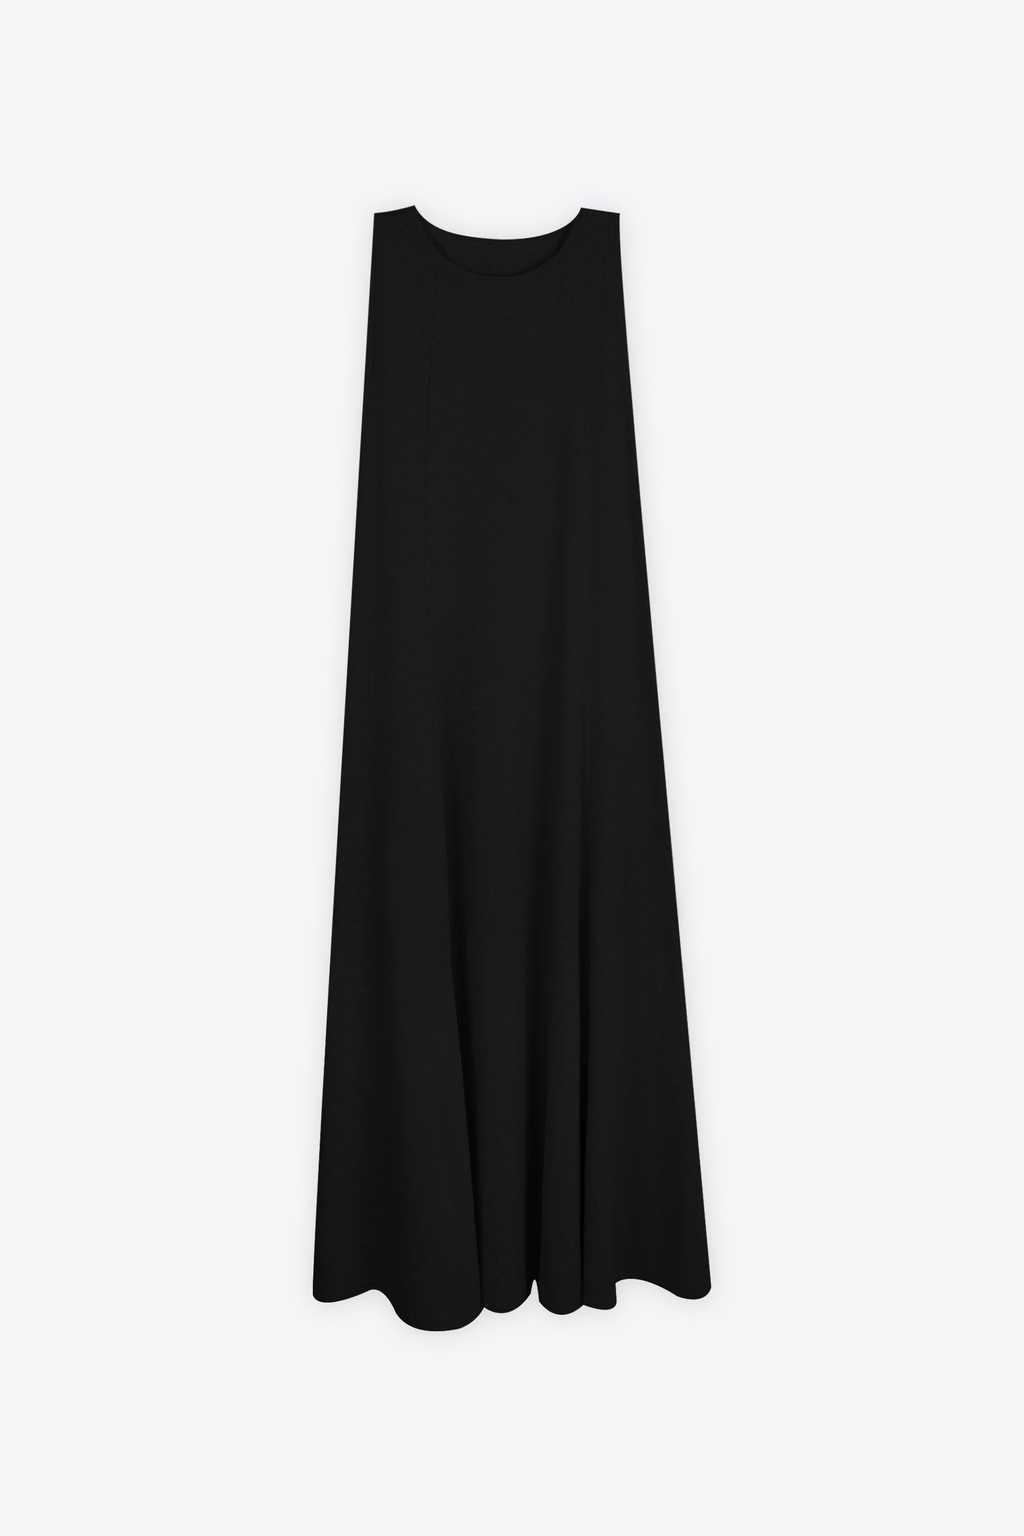 Dress 1205 Black 11